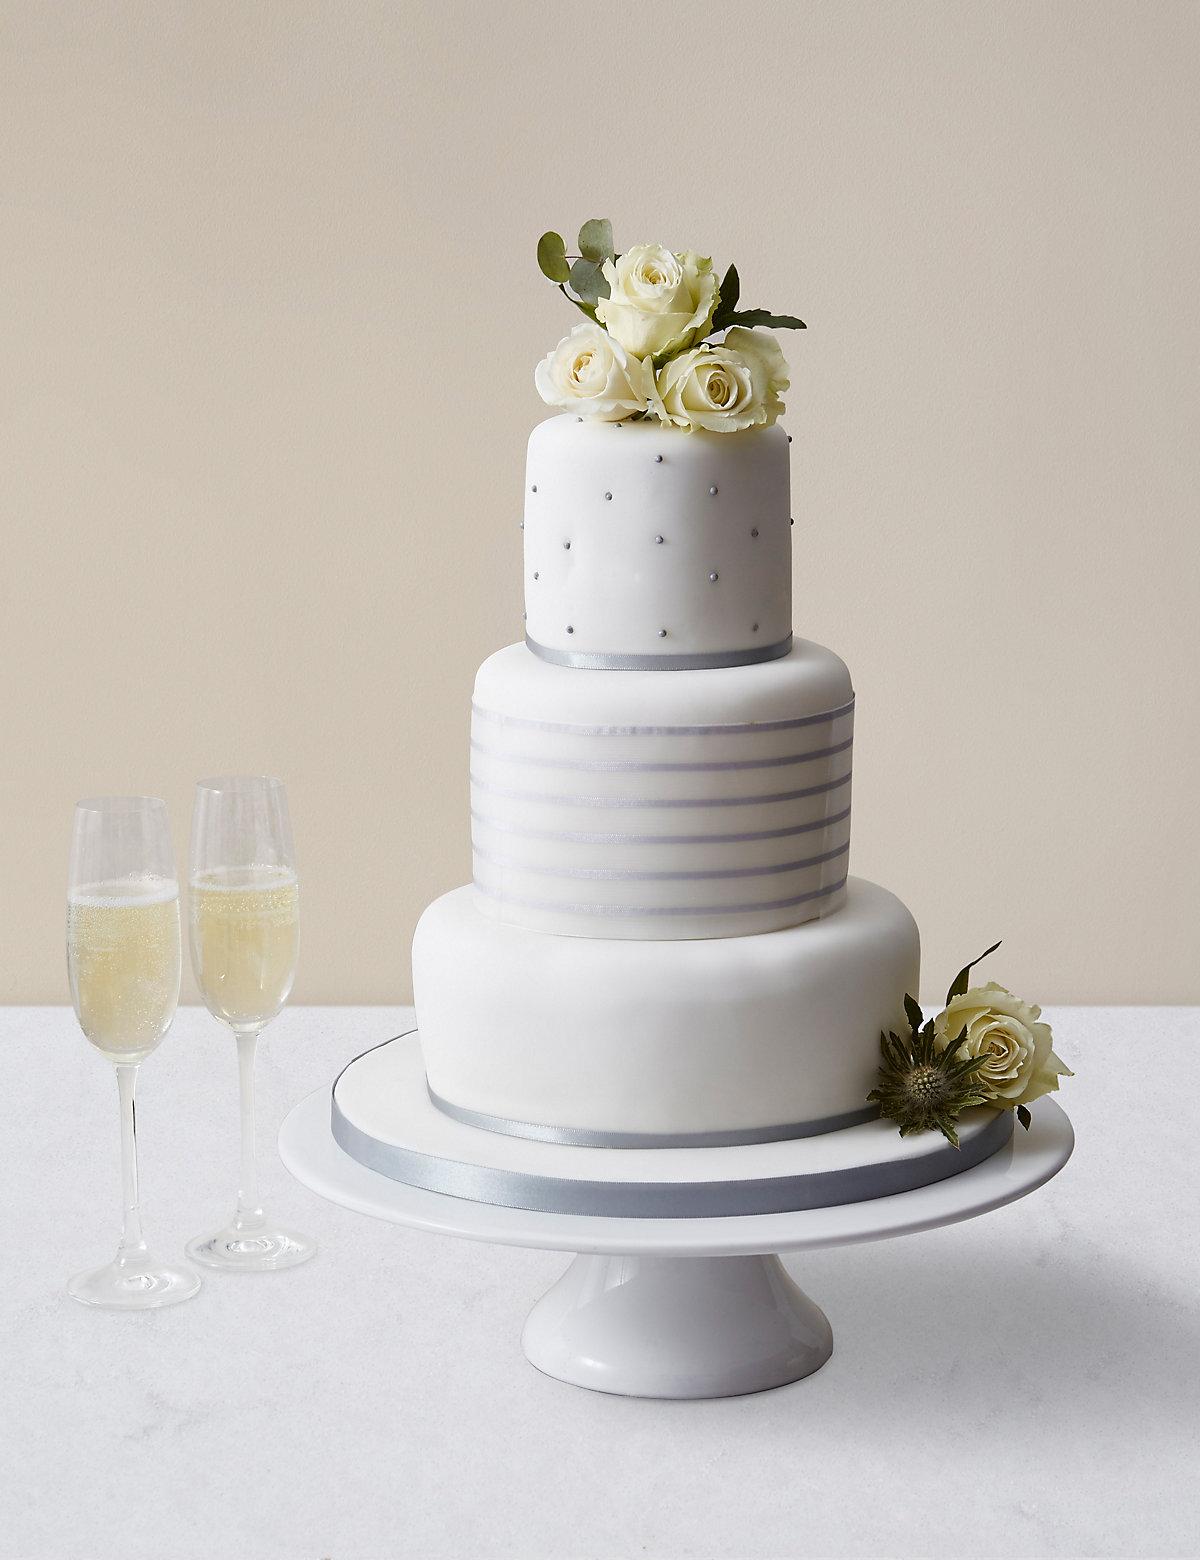 Vogue Wedding Cake White & Silver Icing